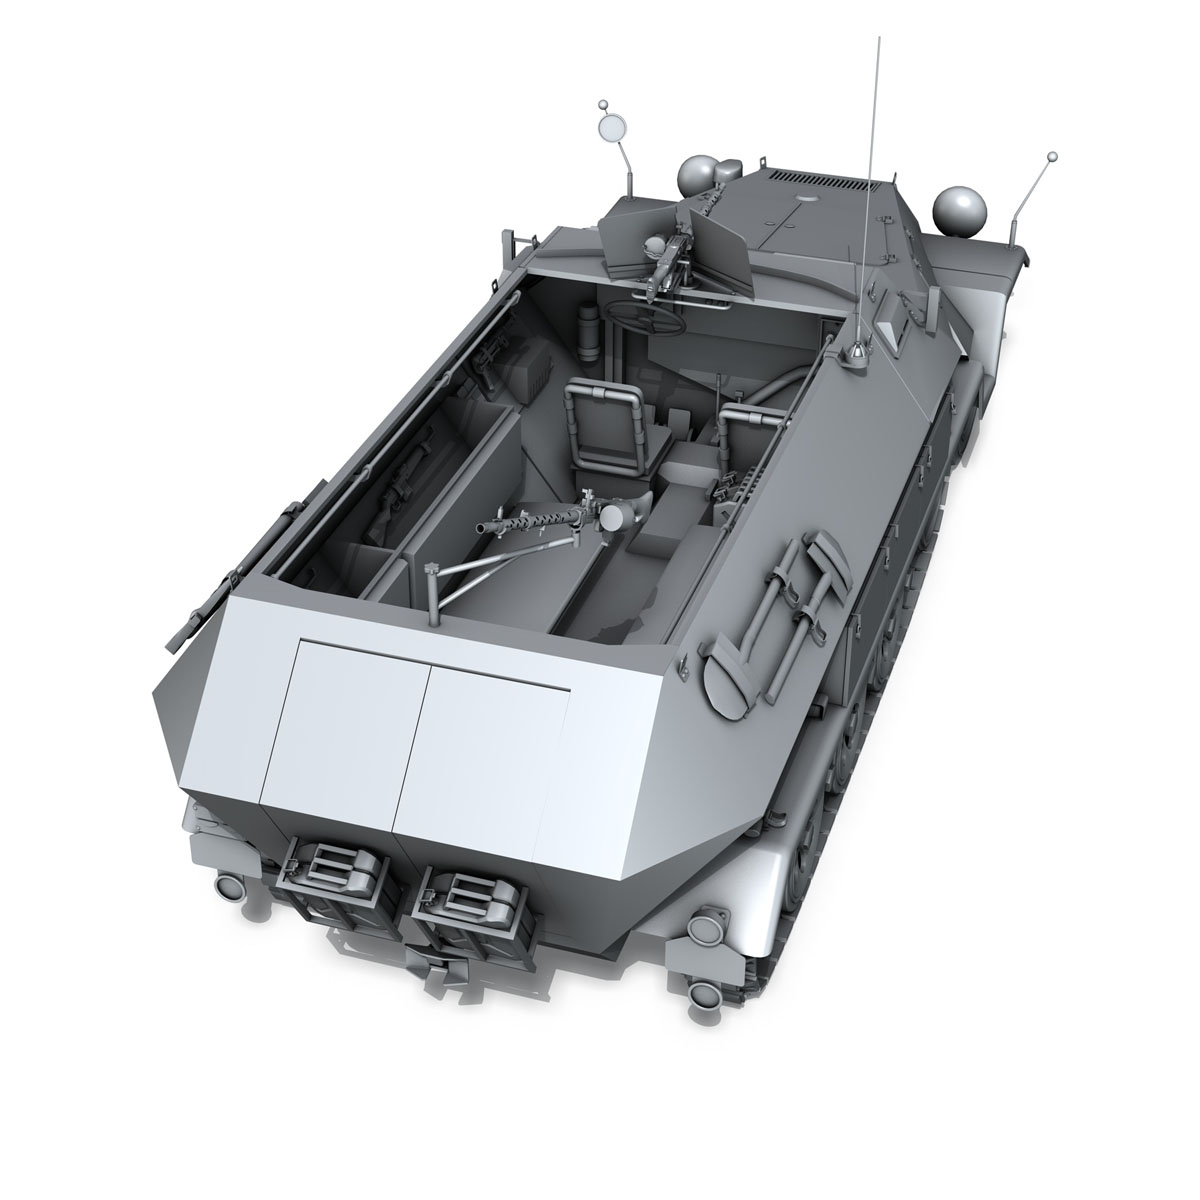 sd.kfz 251/1 ausf.b – hanomag halftruck 3d model 3ds fbx c4d lwo obj 201160